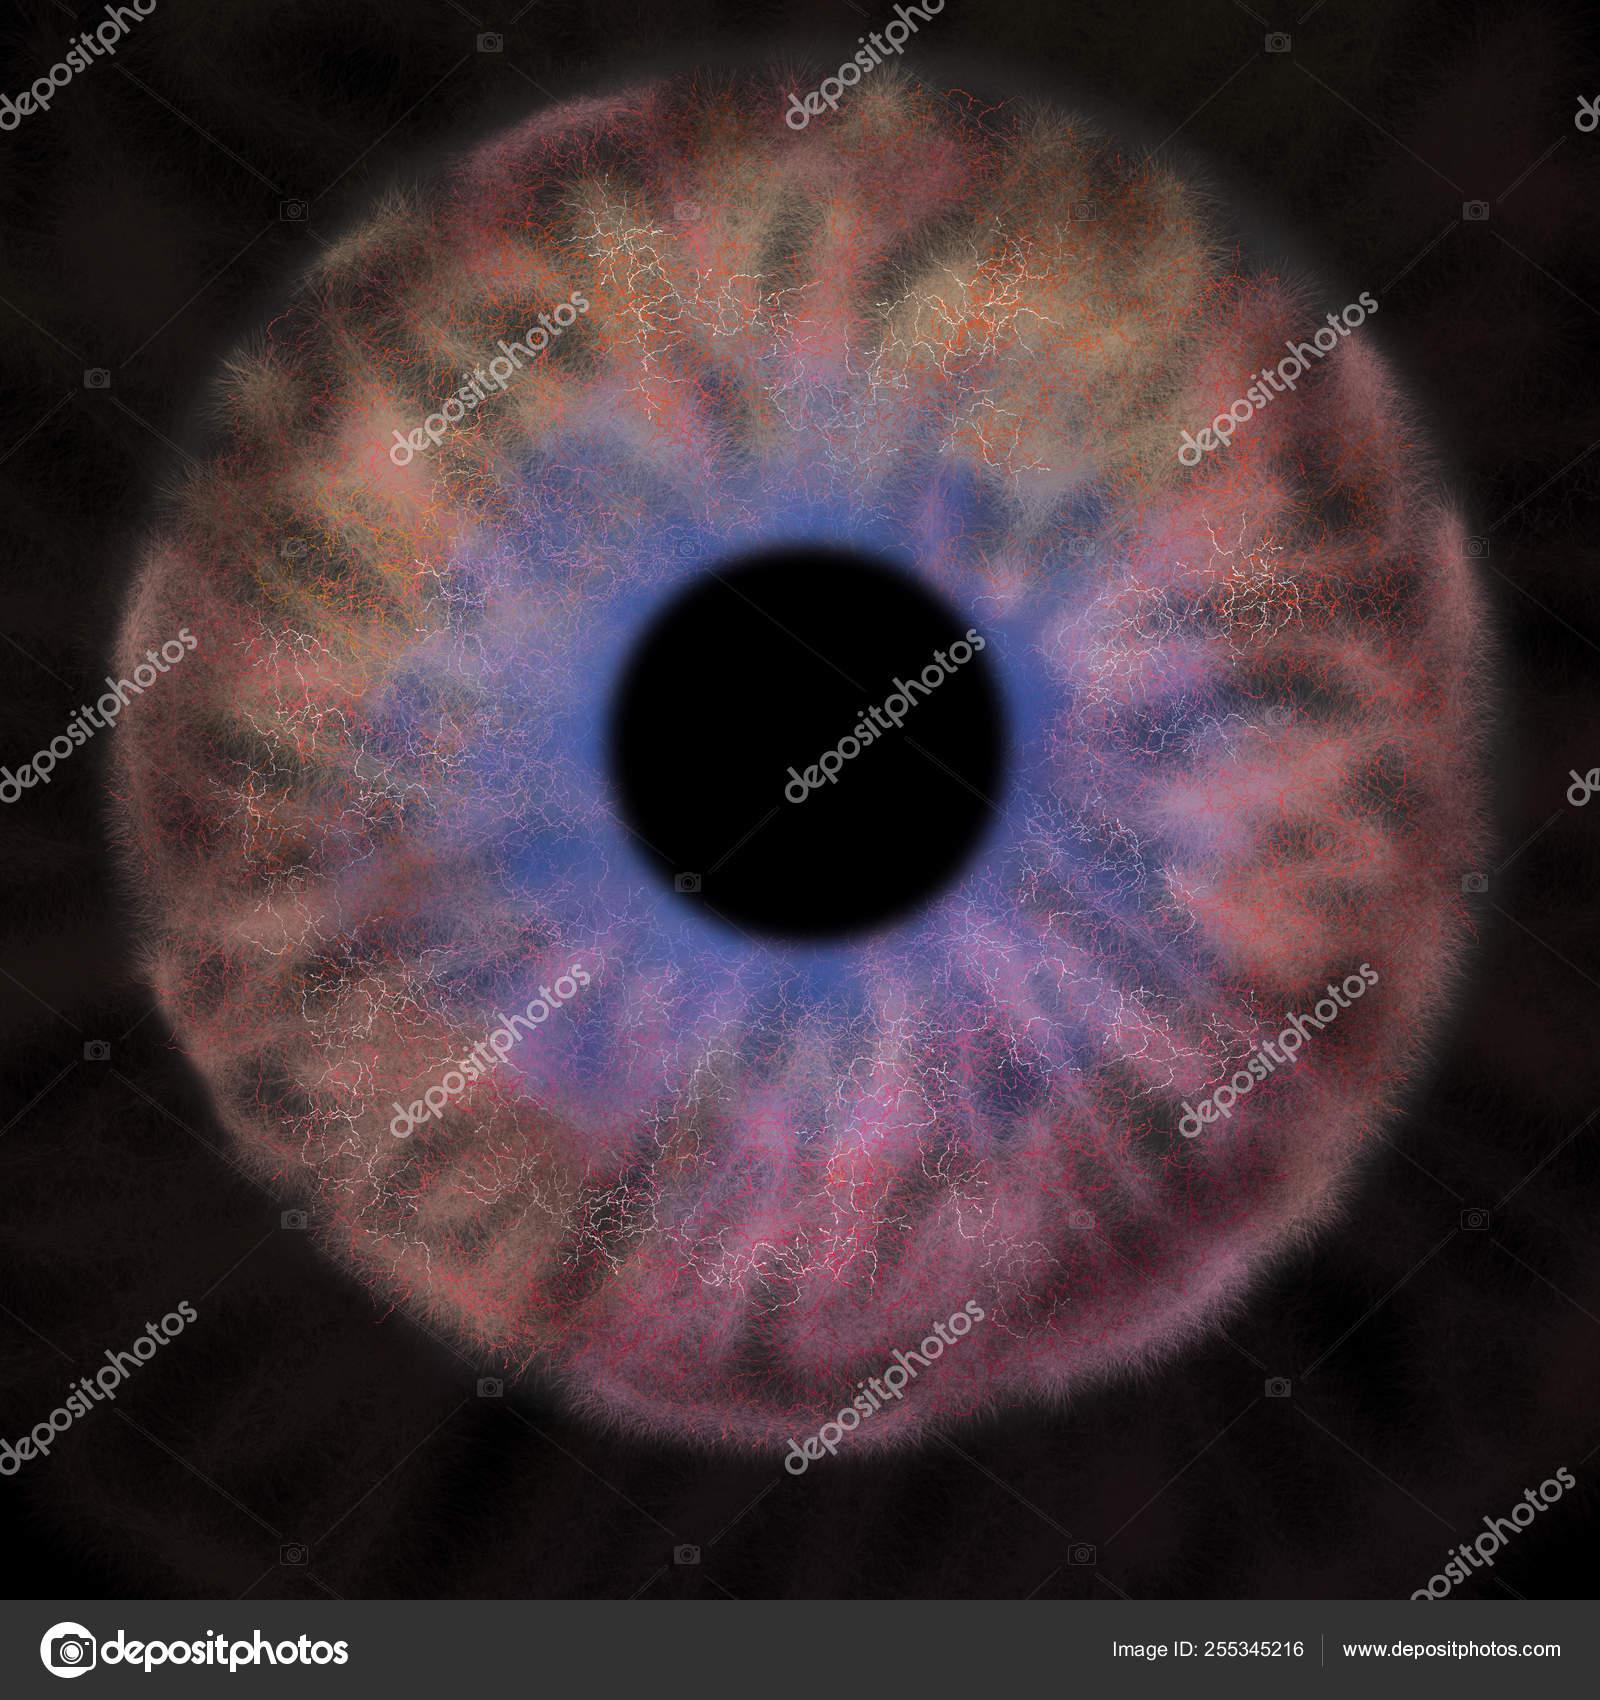 depositphotos 255345216 stock photo iris background black hole